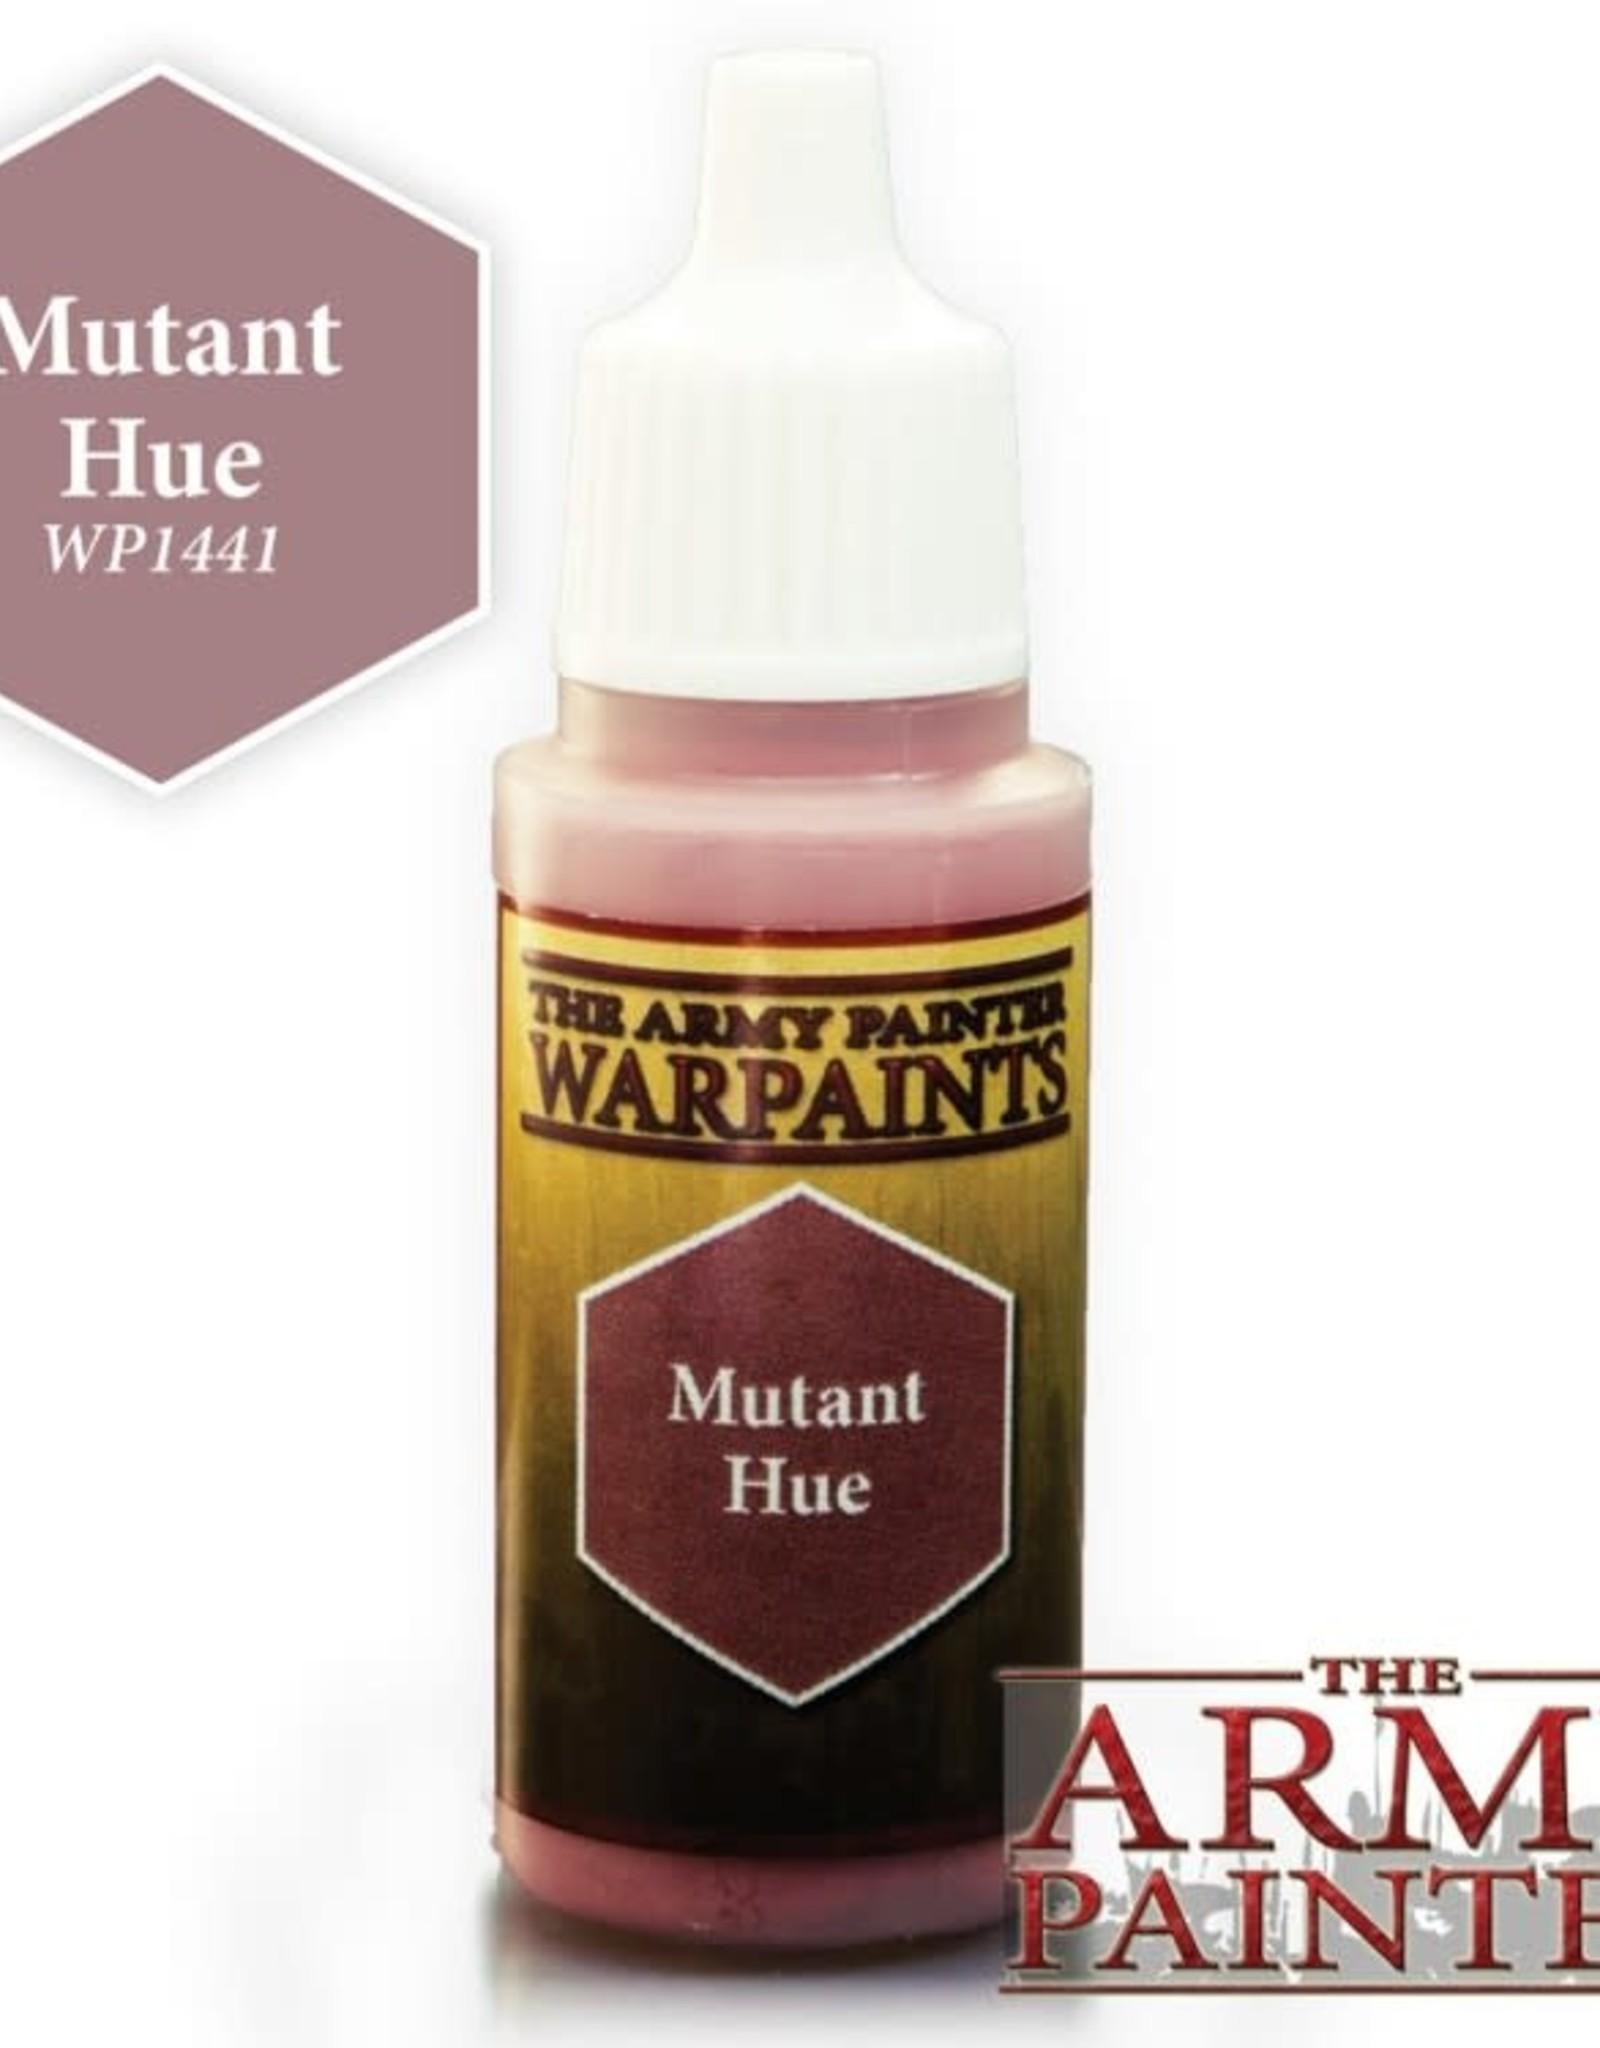 The Army Painter Warpaints - Mutant Hue